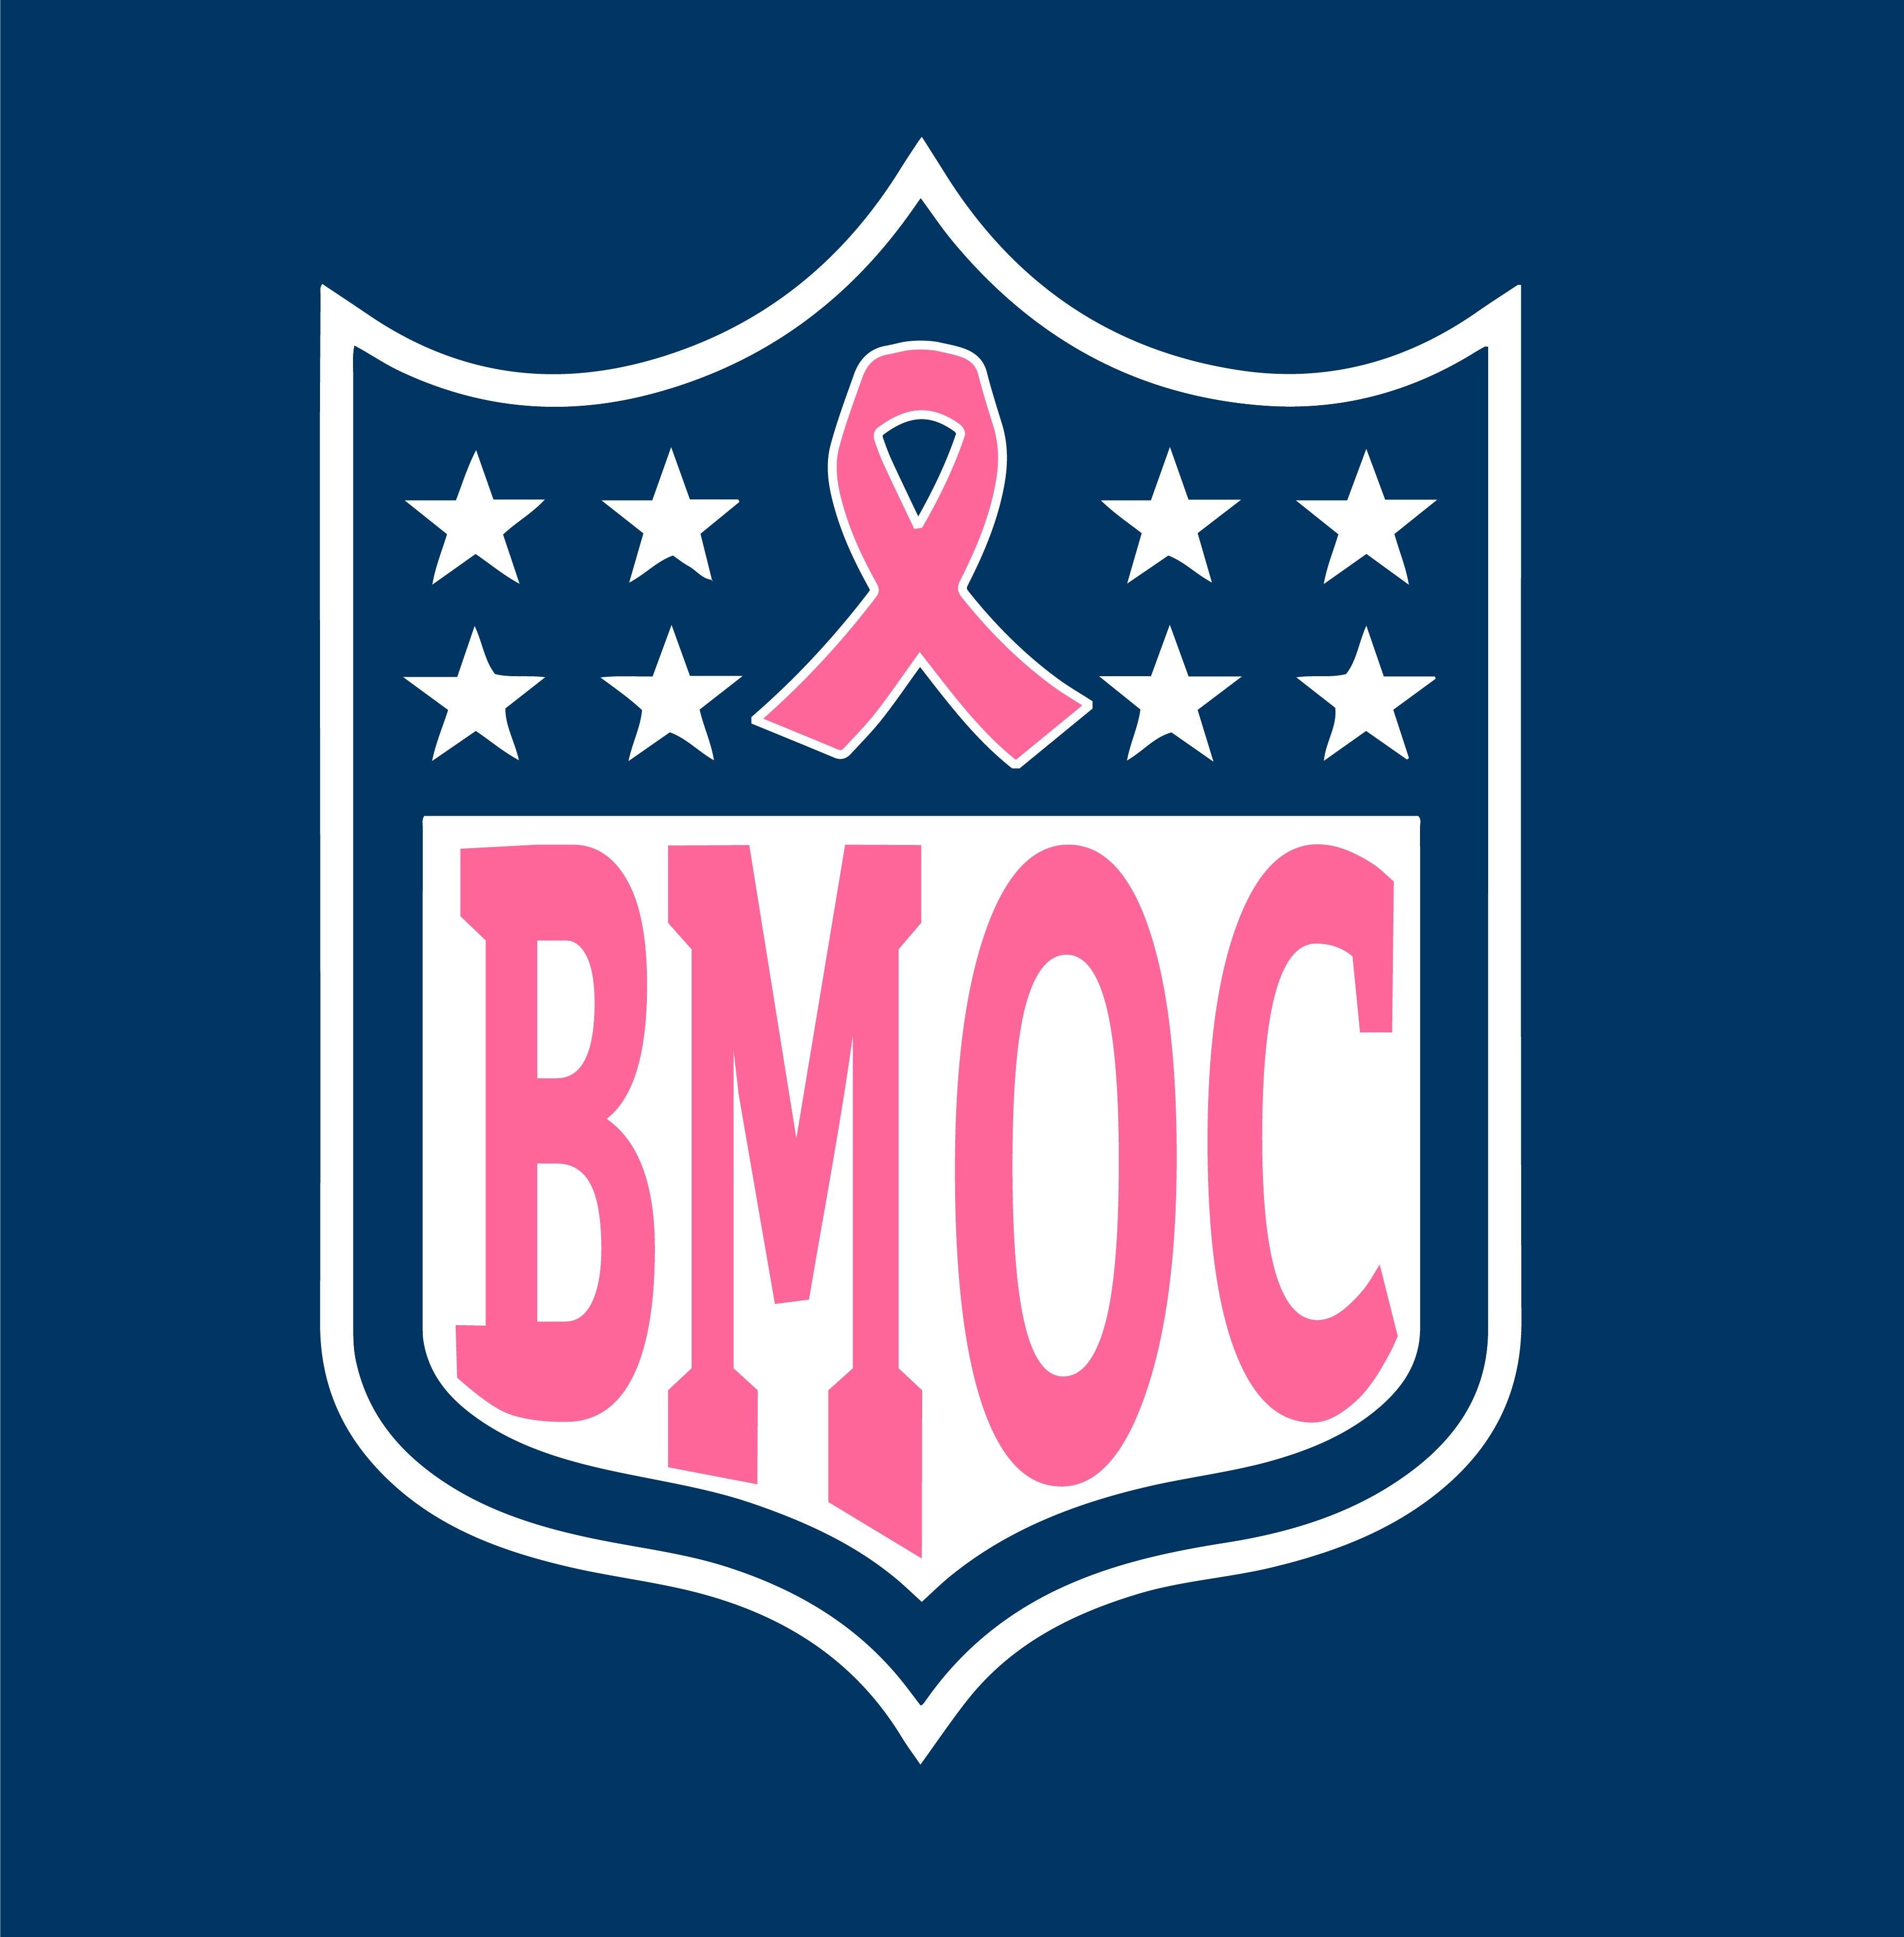 BMOC NFL.jpg